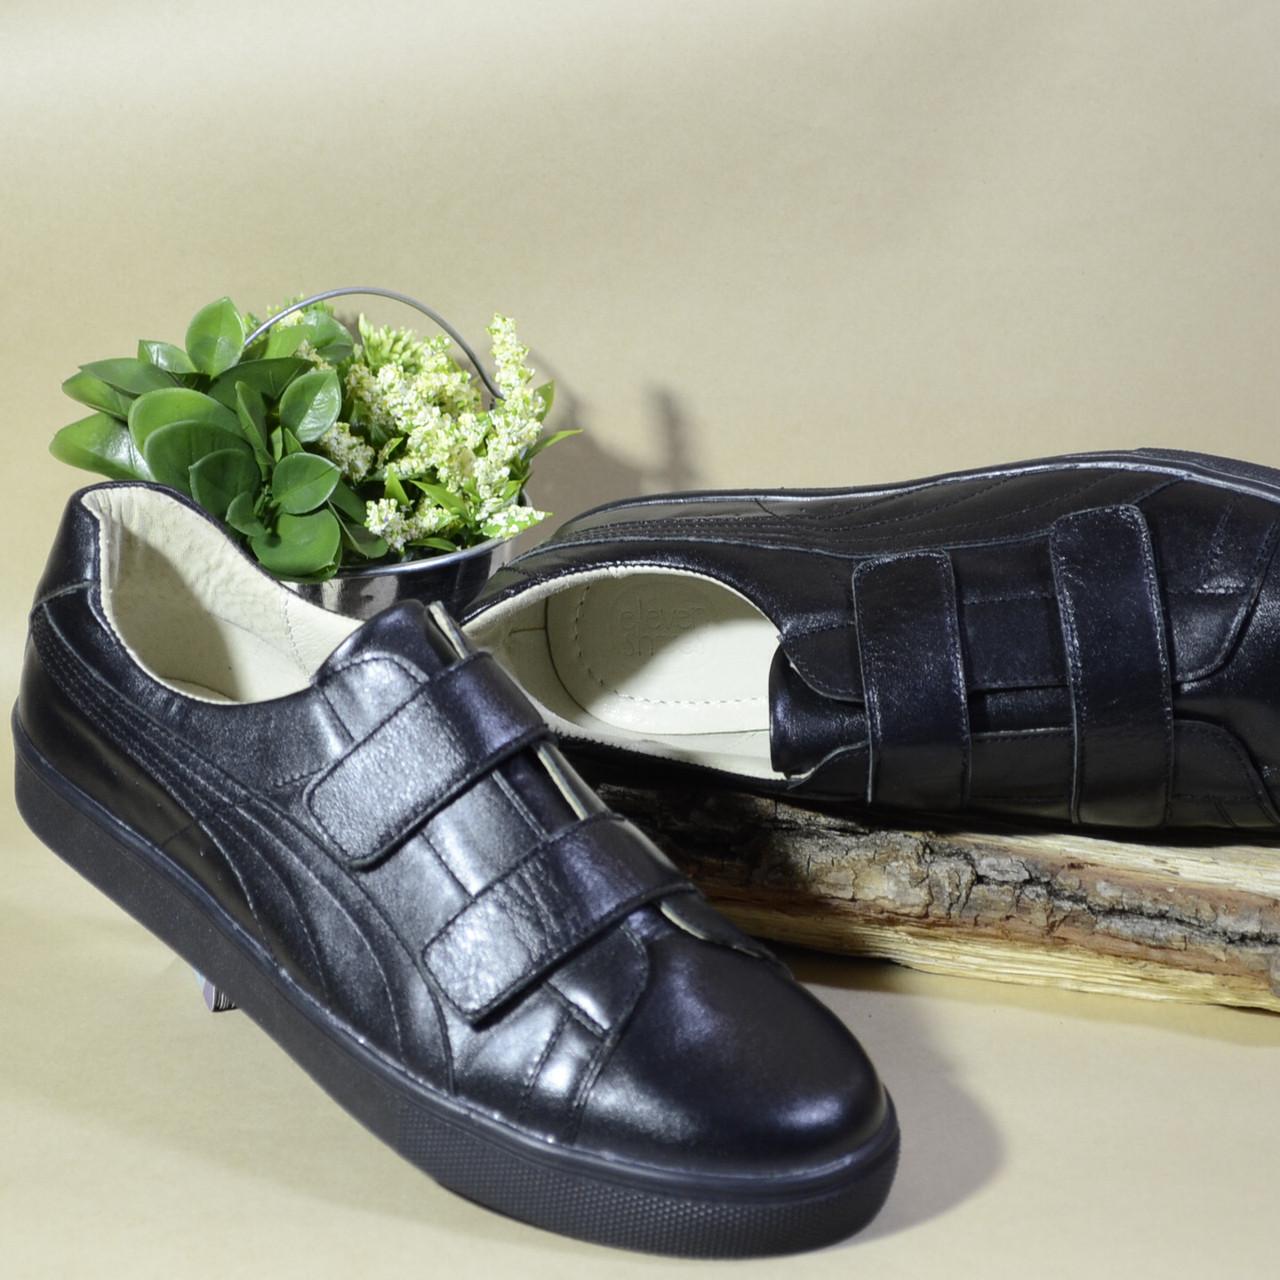 Кроссовки Eleven shoes 16-408-221 (32р - 21,5см)